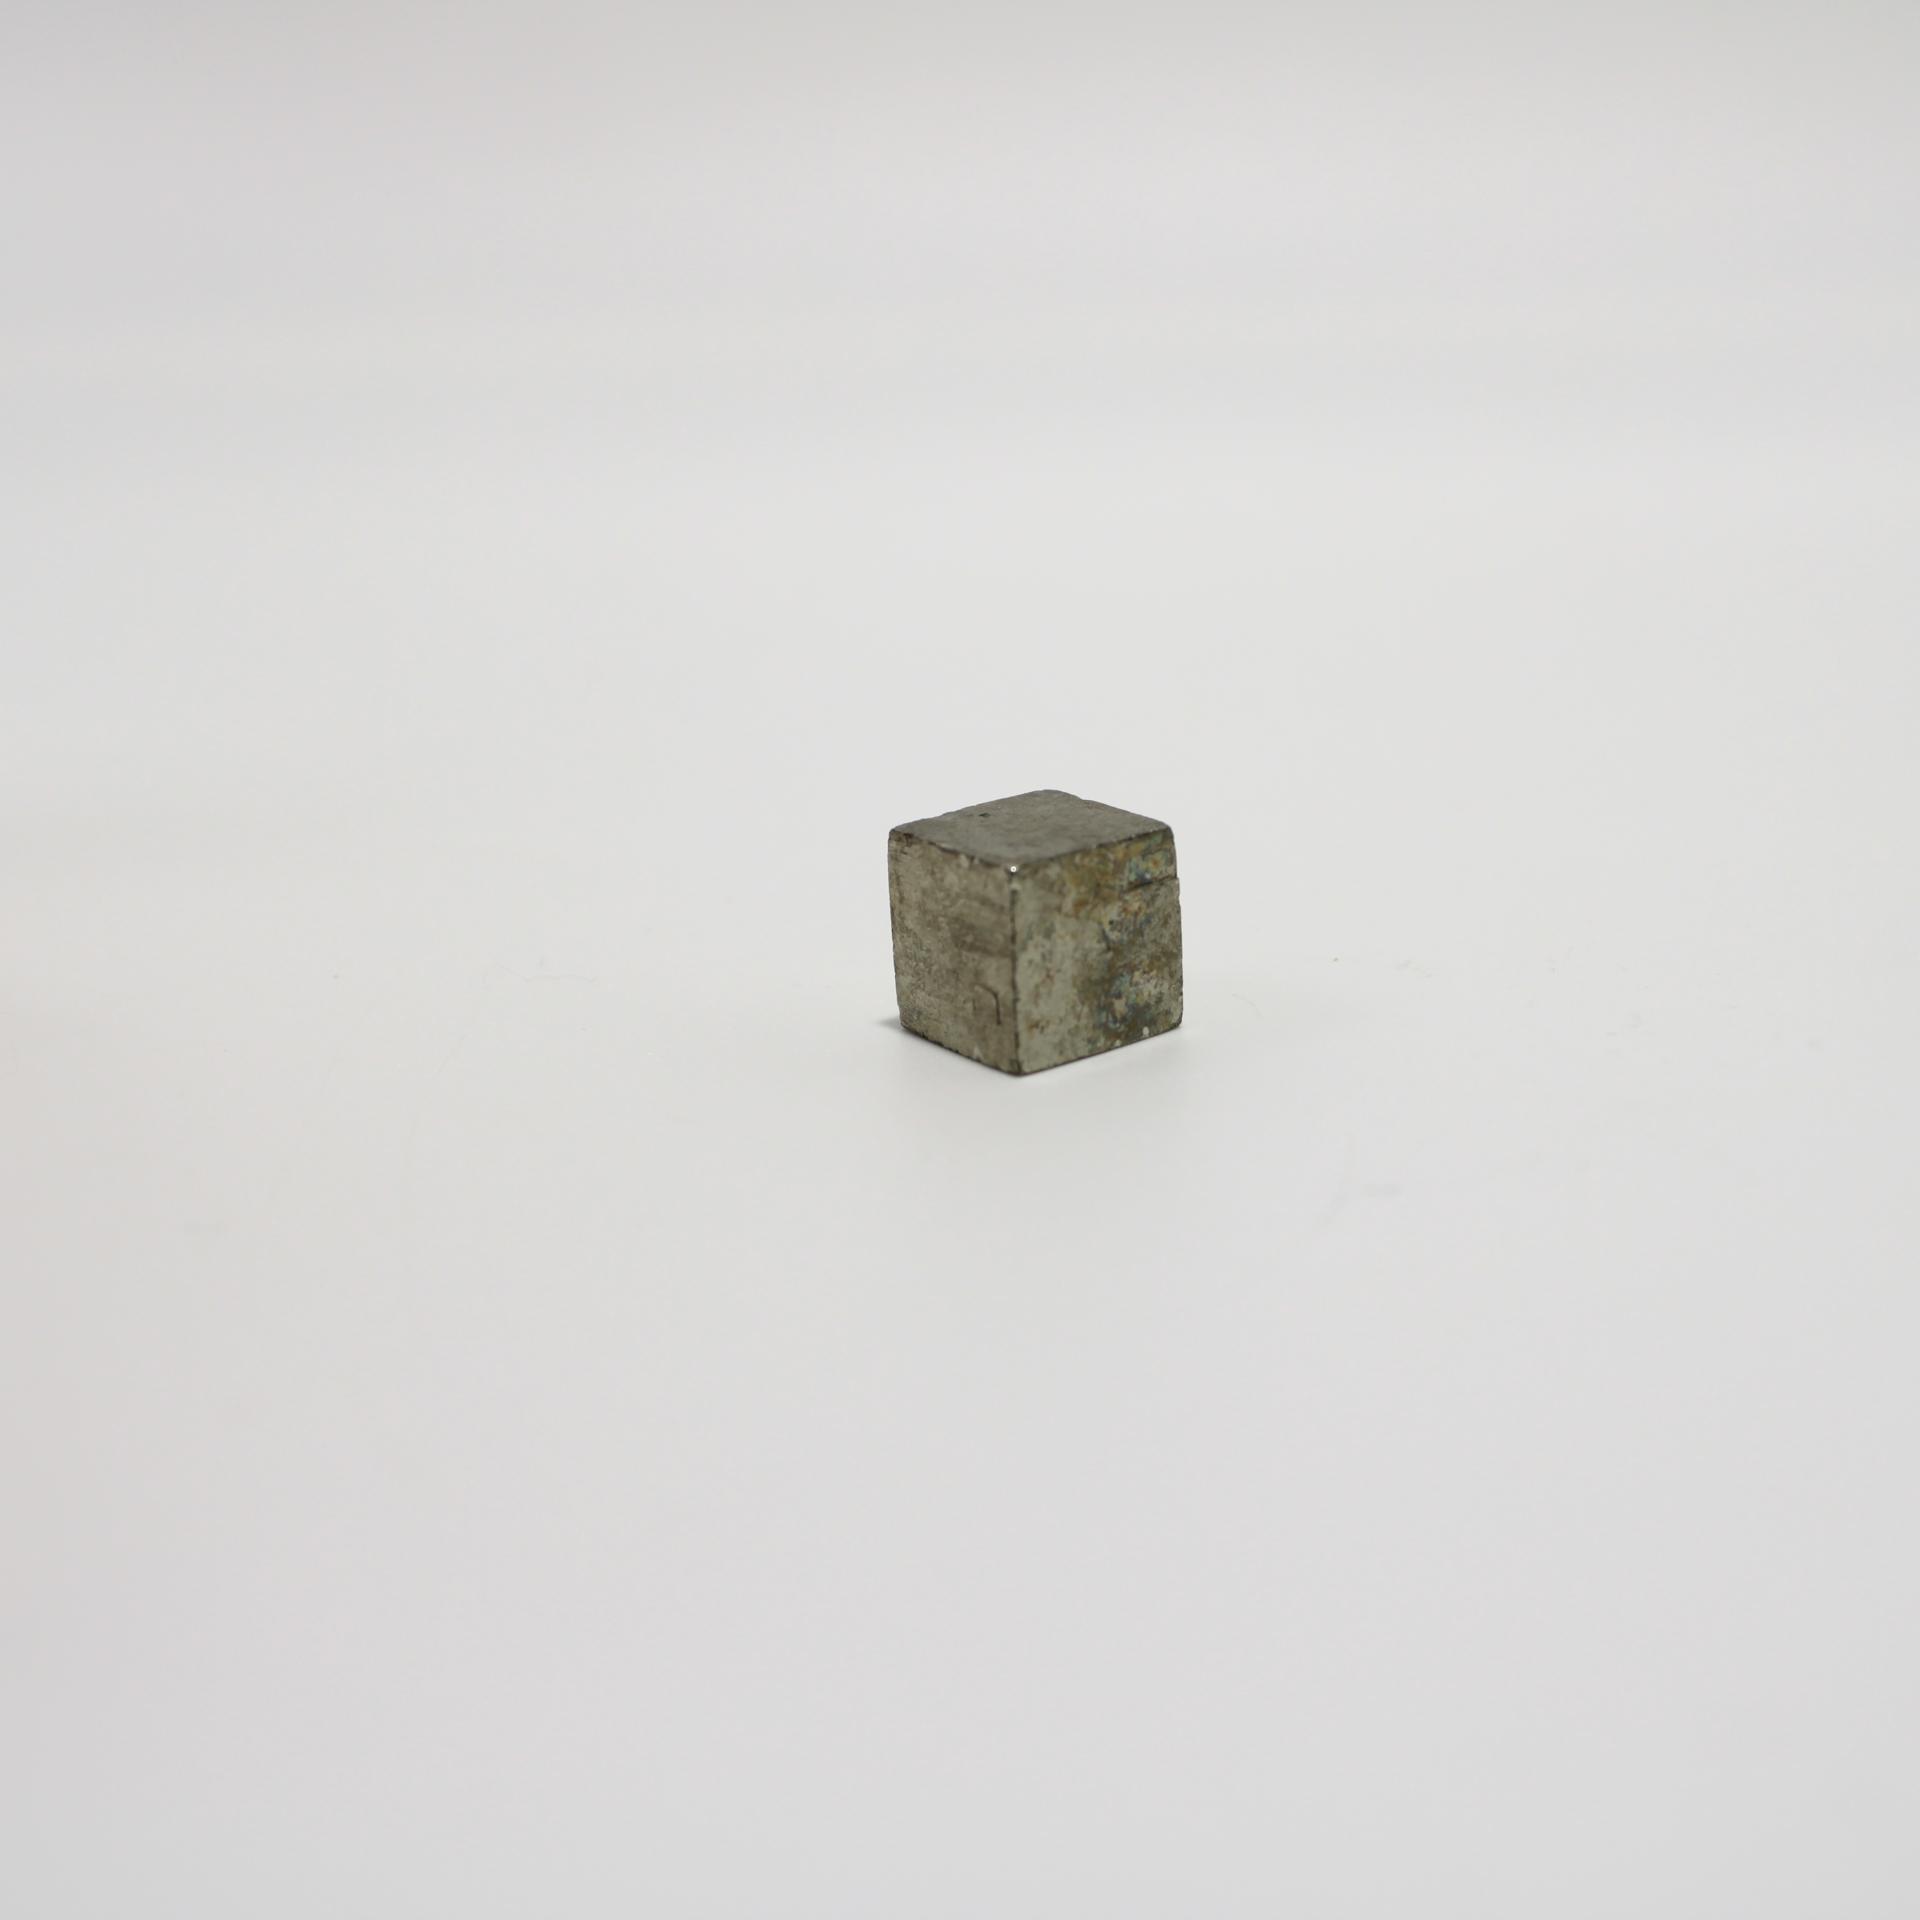 I74 pyritecube 3